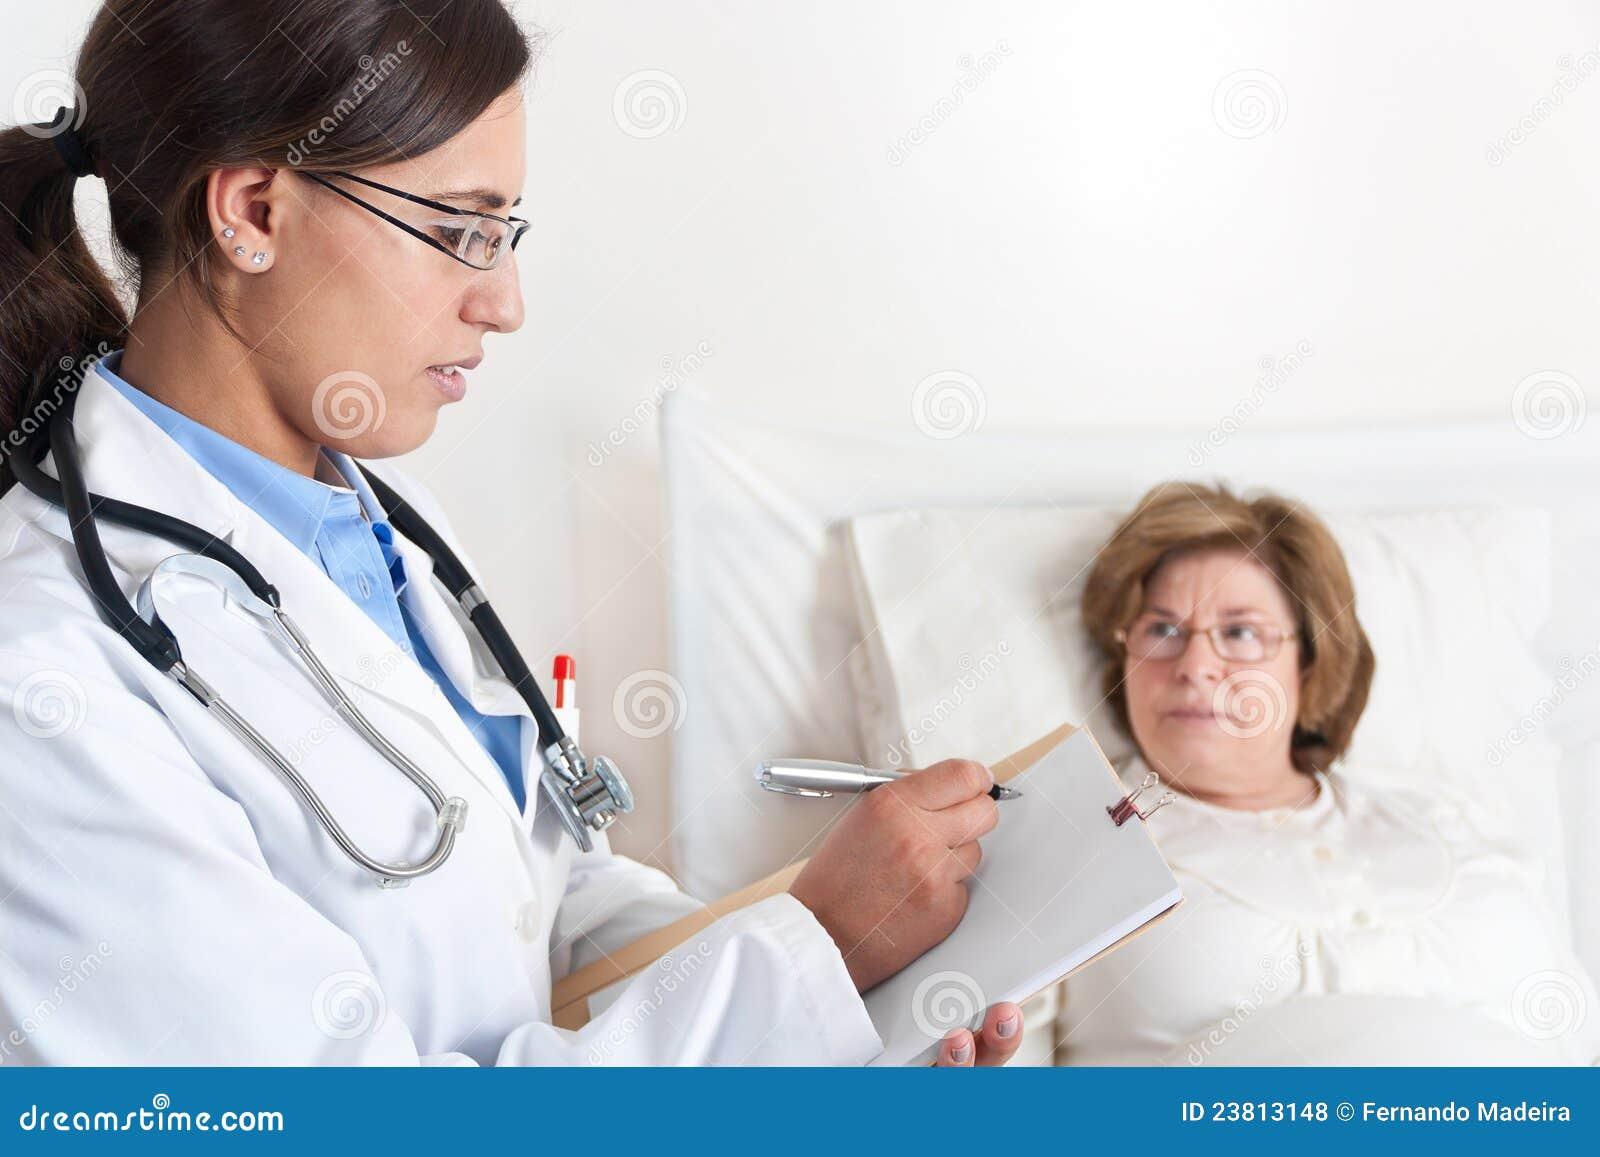 General Prescribing Guidance